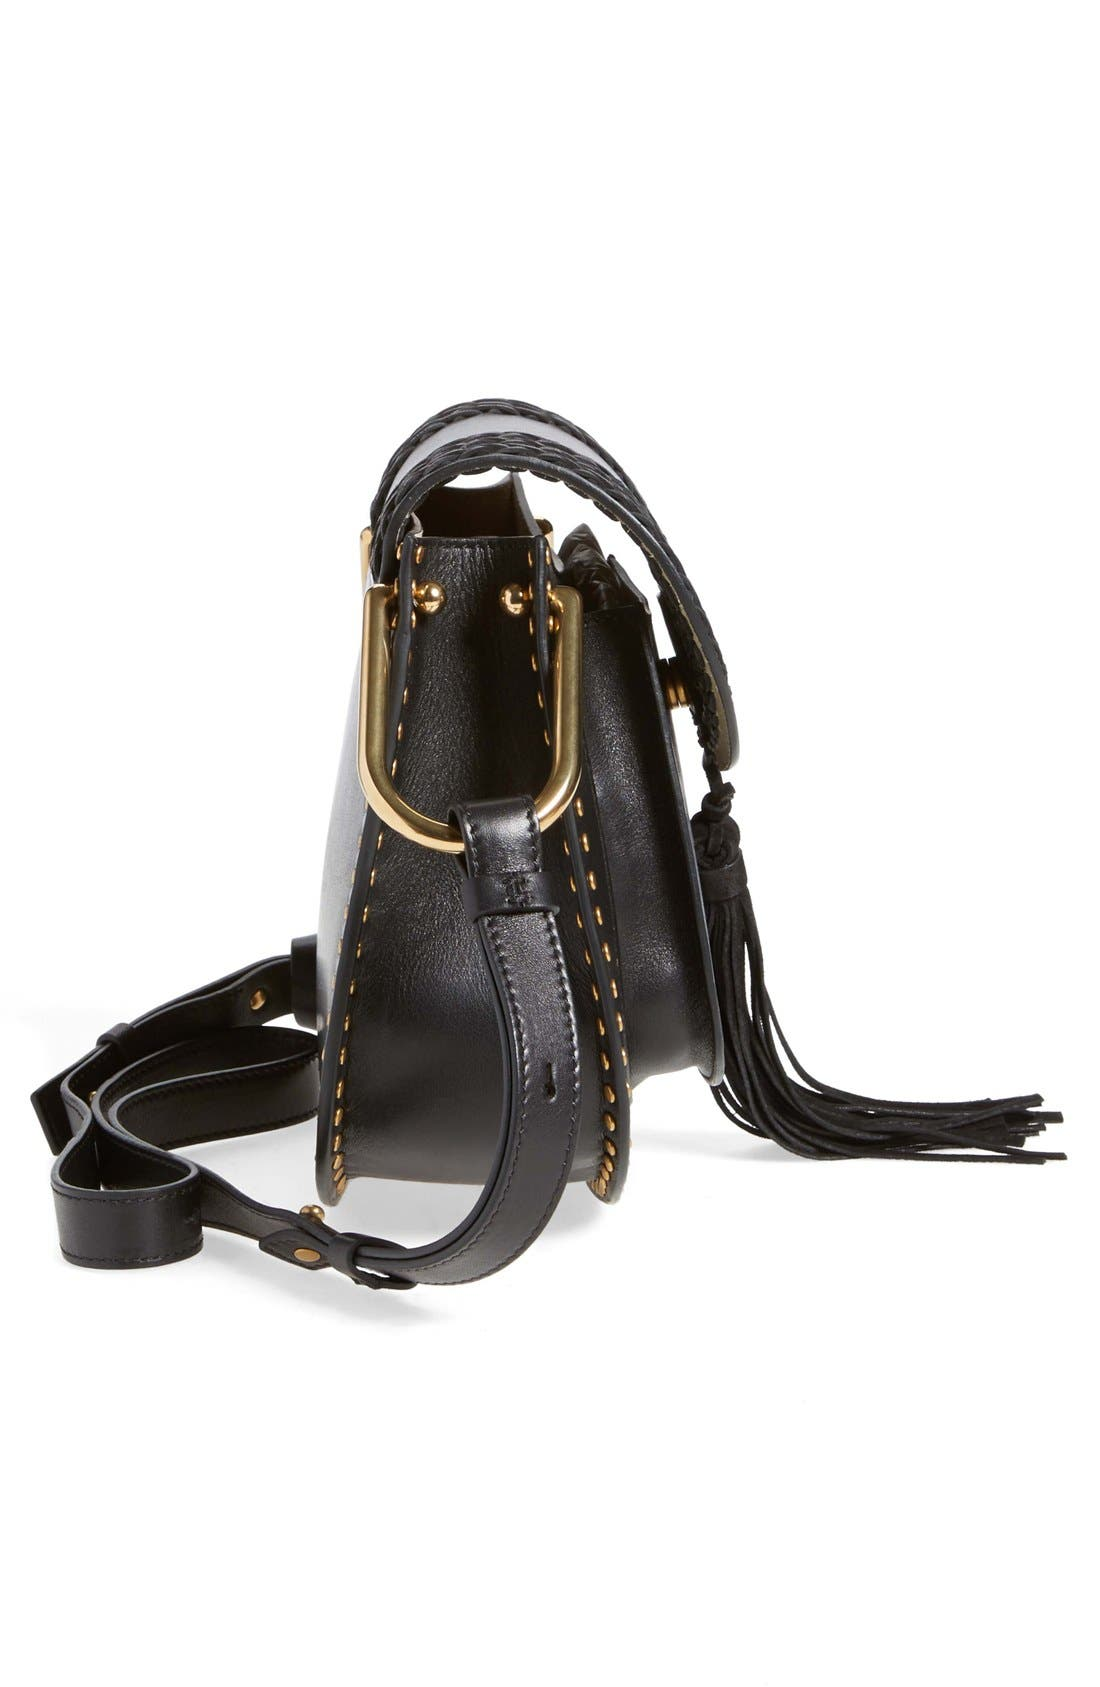 CHLOÉ,                             'Small Hudson' Studded Calfskin Leather Crossbody Bag,                             Alternate thumbnail 6, color,                             001